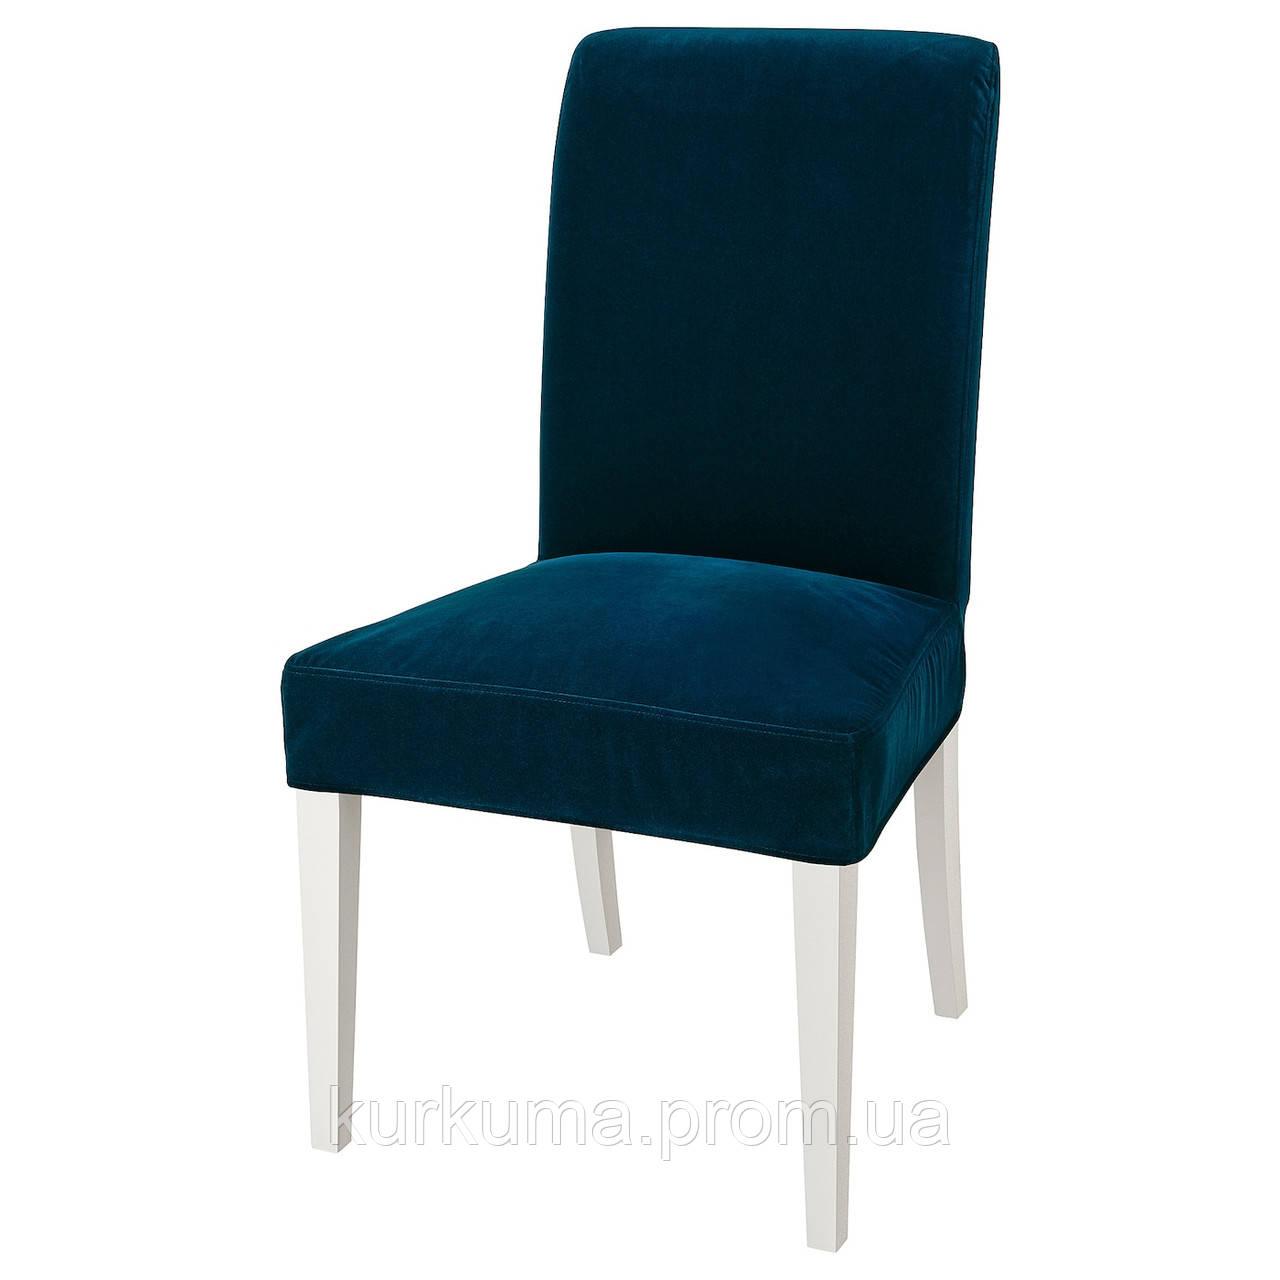 IKEA HENRIKSDAL Стул, белый, Джупарп темно-зеленый синий (893.370.32)